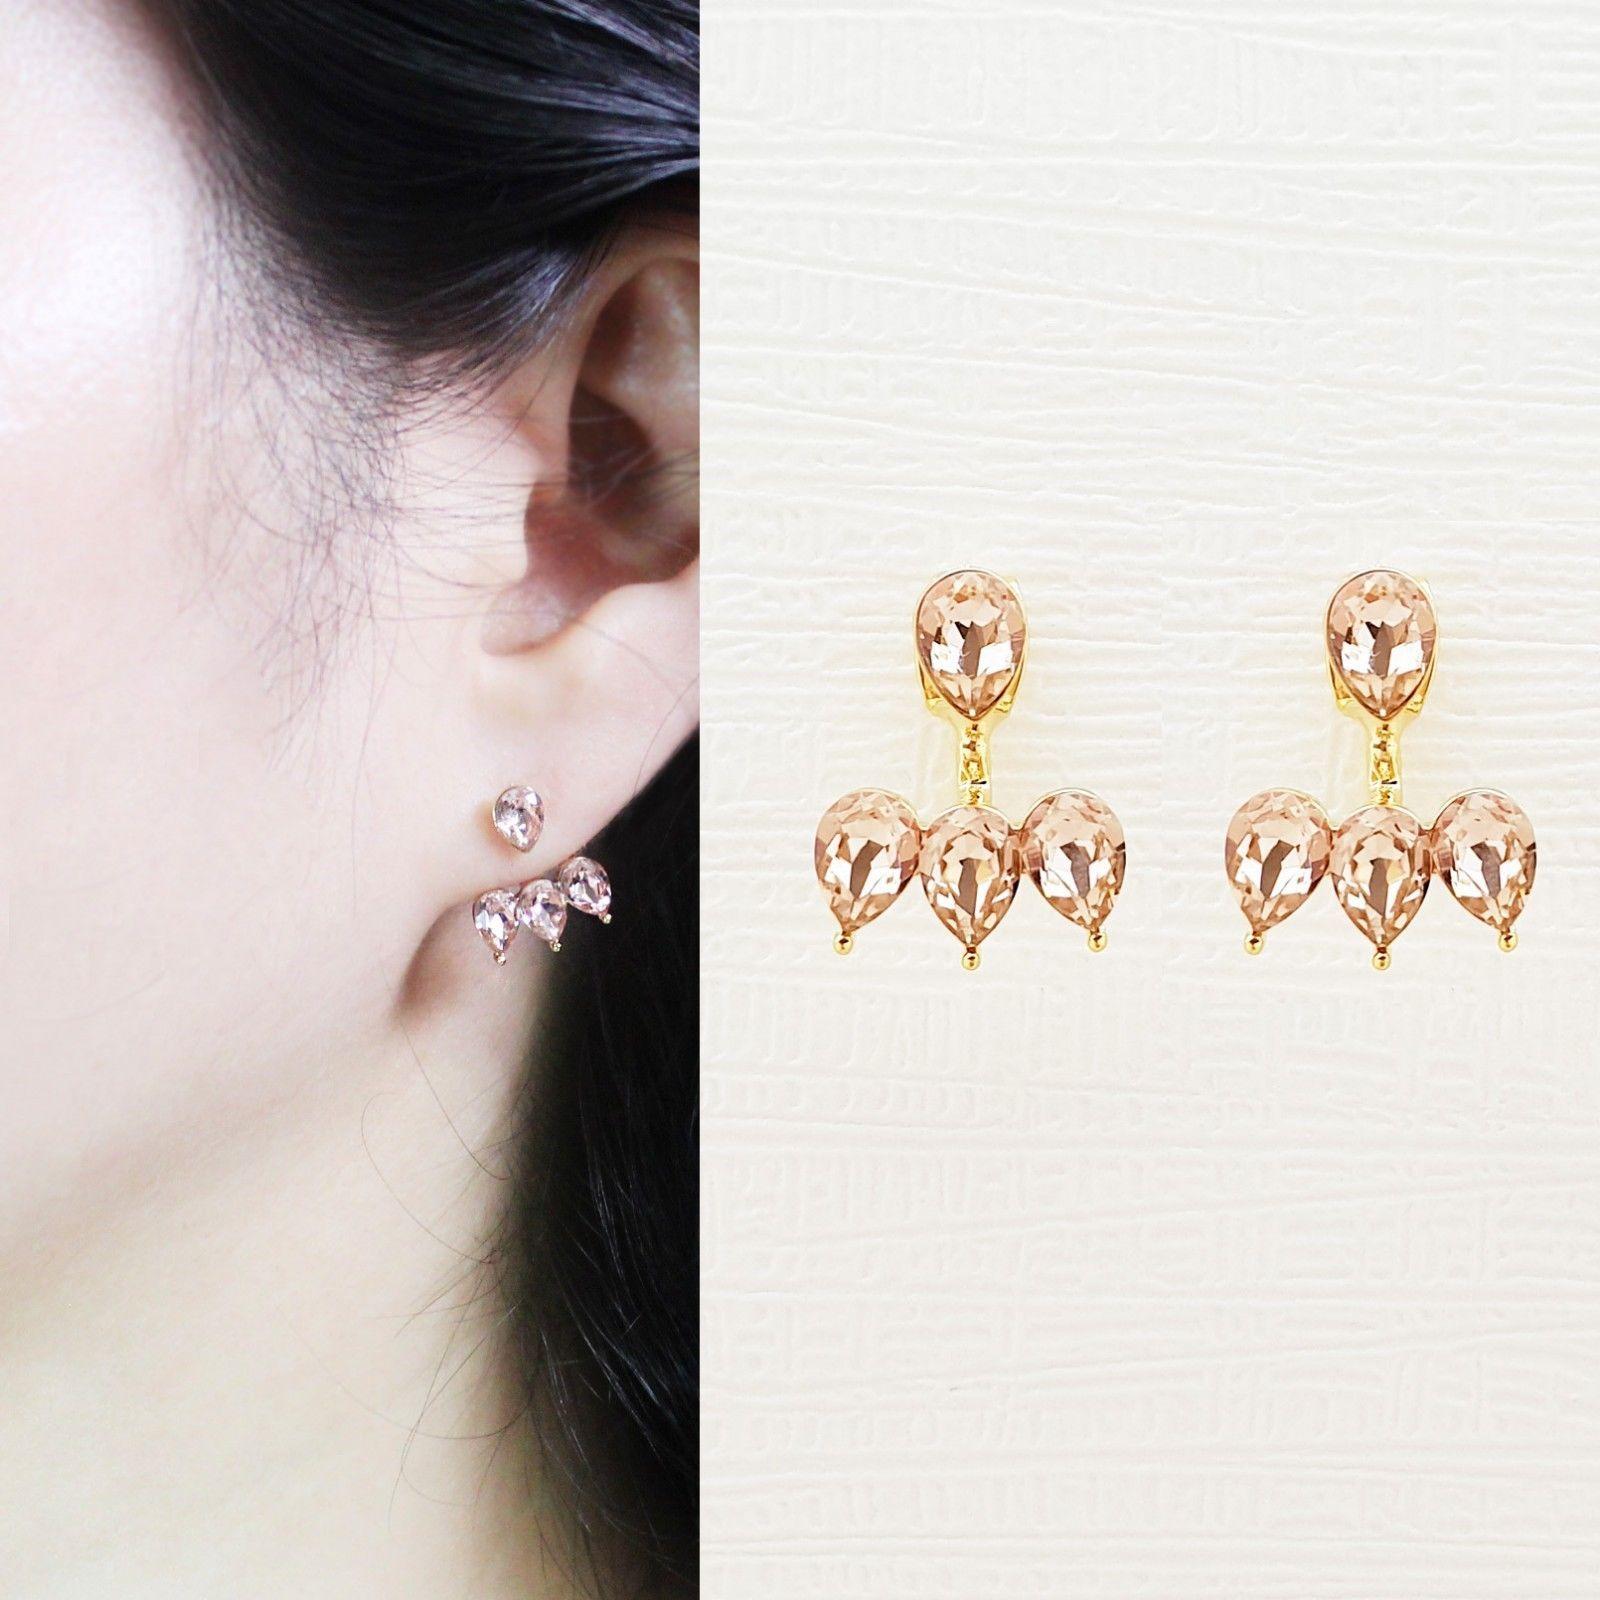 Rain Drop Double Sided Made With Swarovski Crystal Dangle Earrings 925 Silver